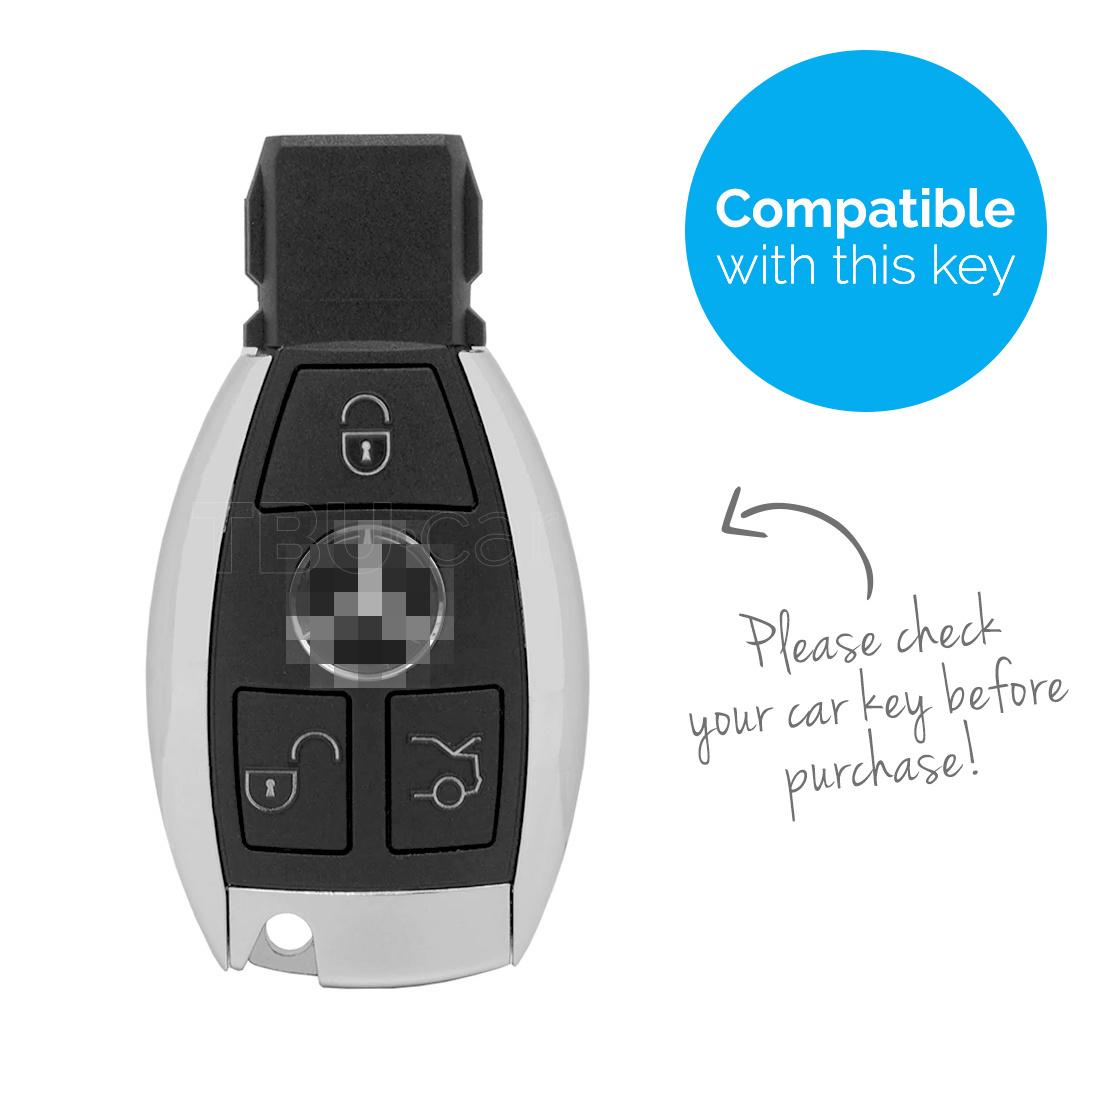 TBU car Autoschlüssel Hülle für Mercedes 3 Tasten - Schutzhülle aus Silikon - Auto Schlüsselhülle Cover in Lindgrün